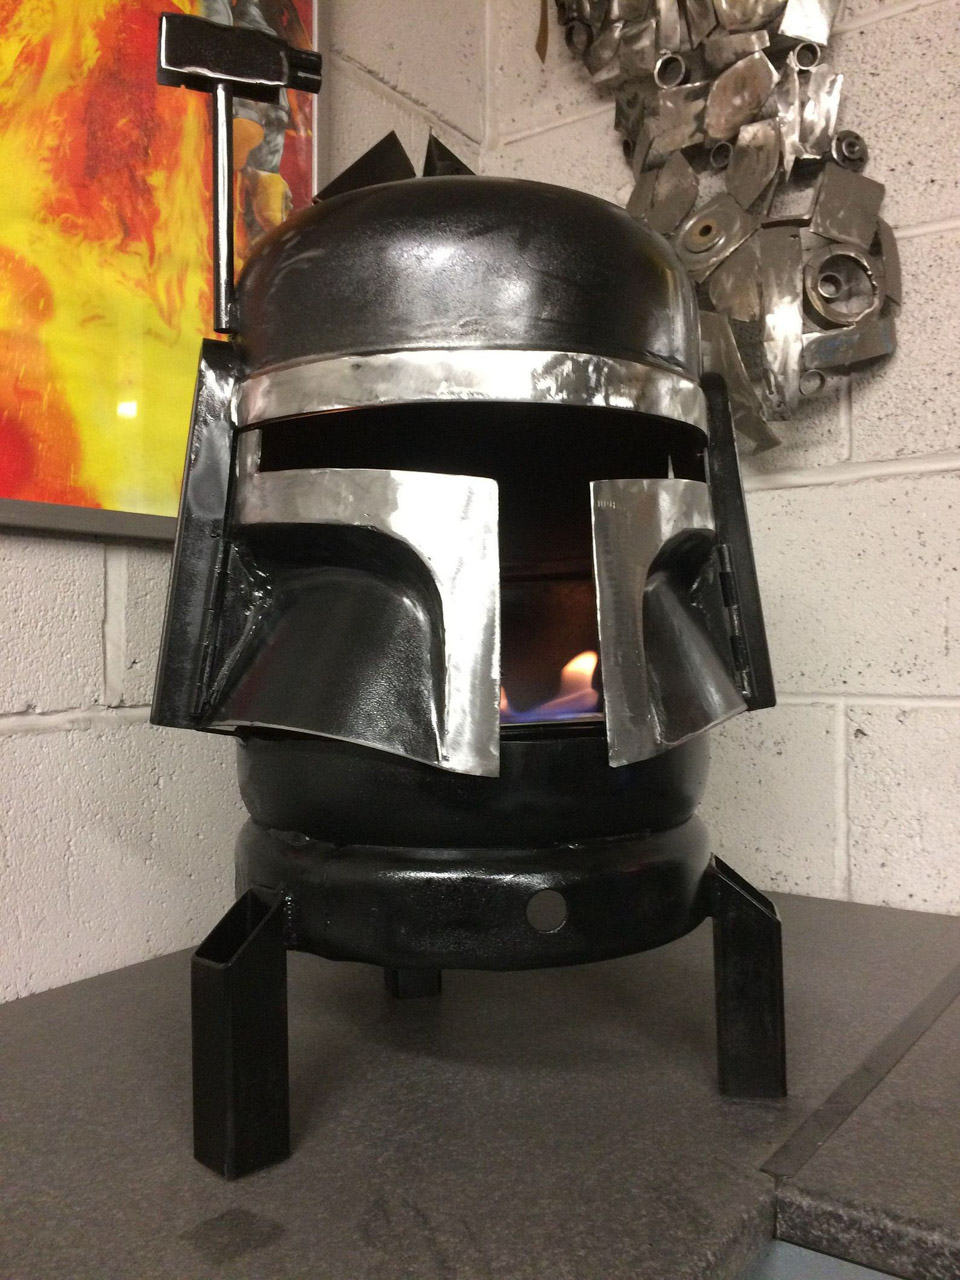 Boba Fett Wood Burner - Boba Fett Fire Pit - Star Wars Fire Pit - Metal Art - Fire Pit - Wood Burner - Star Wars Gifts